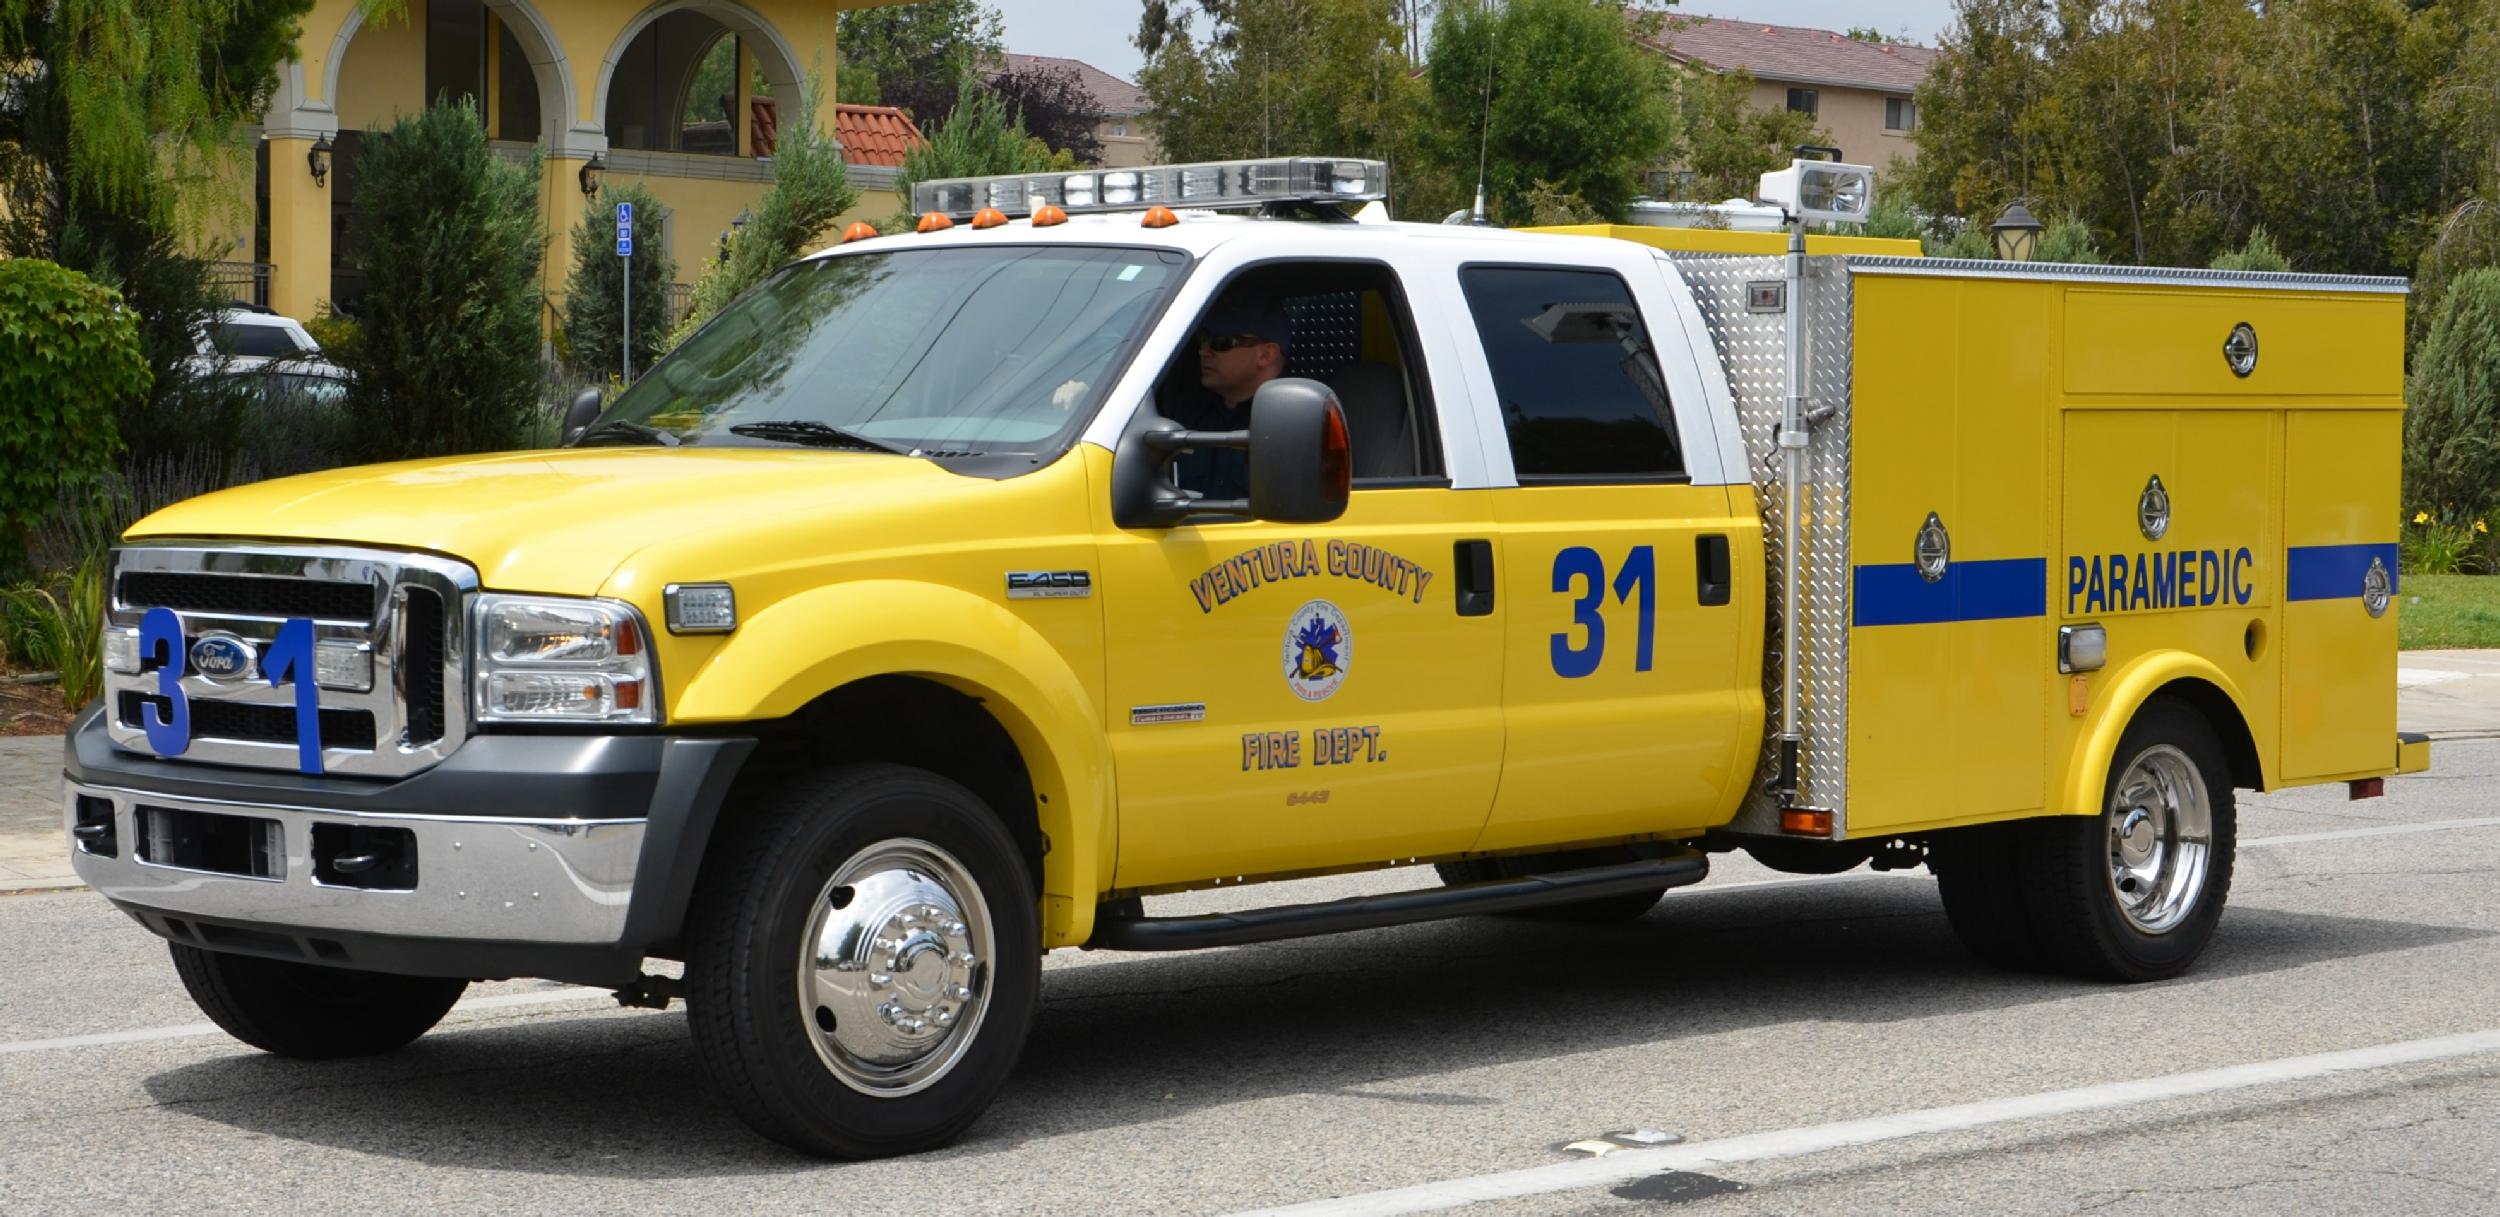 ca ventura county fire department squad